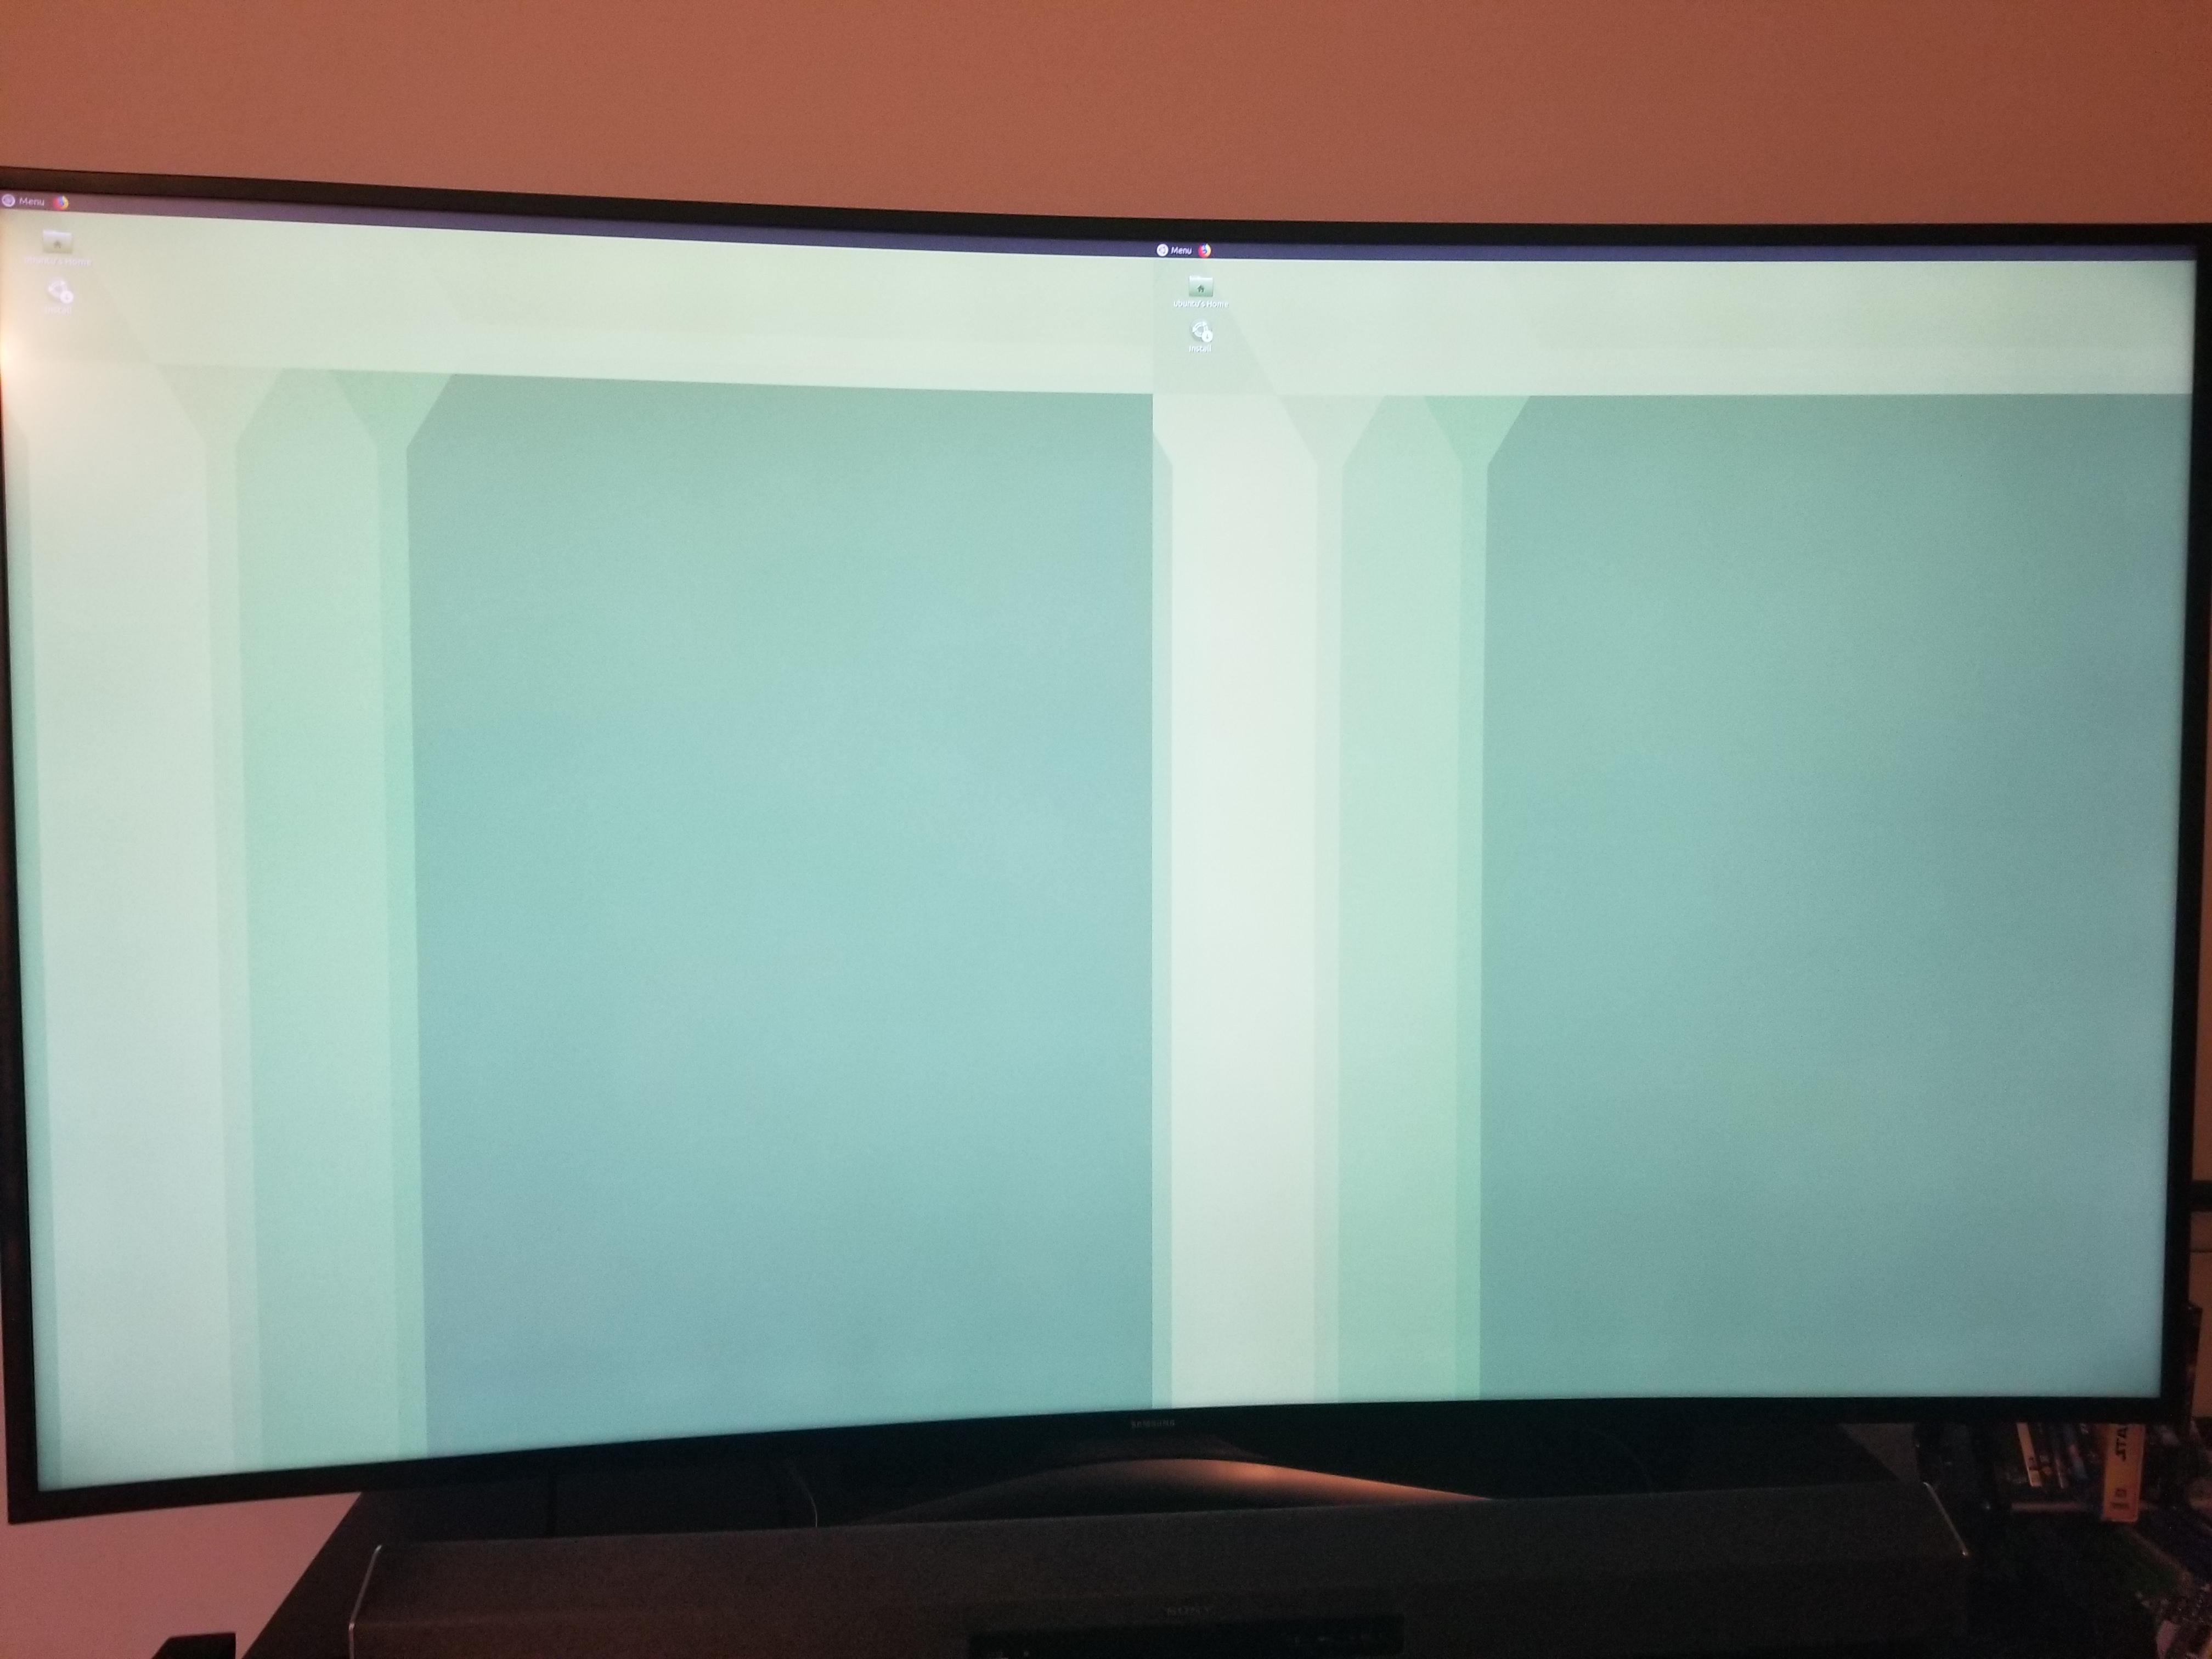 Ubuntu 18 04 installation issues on Ryzen 2400G - Linux